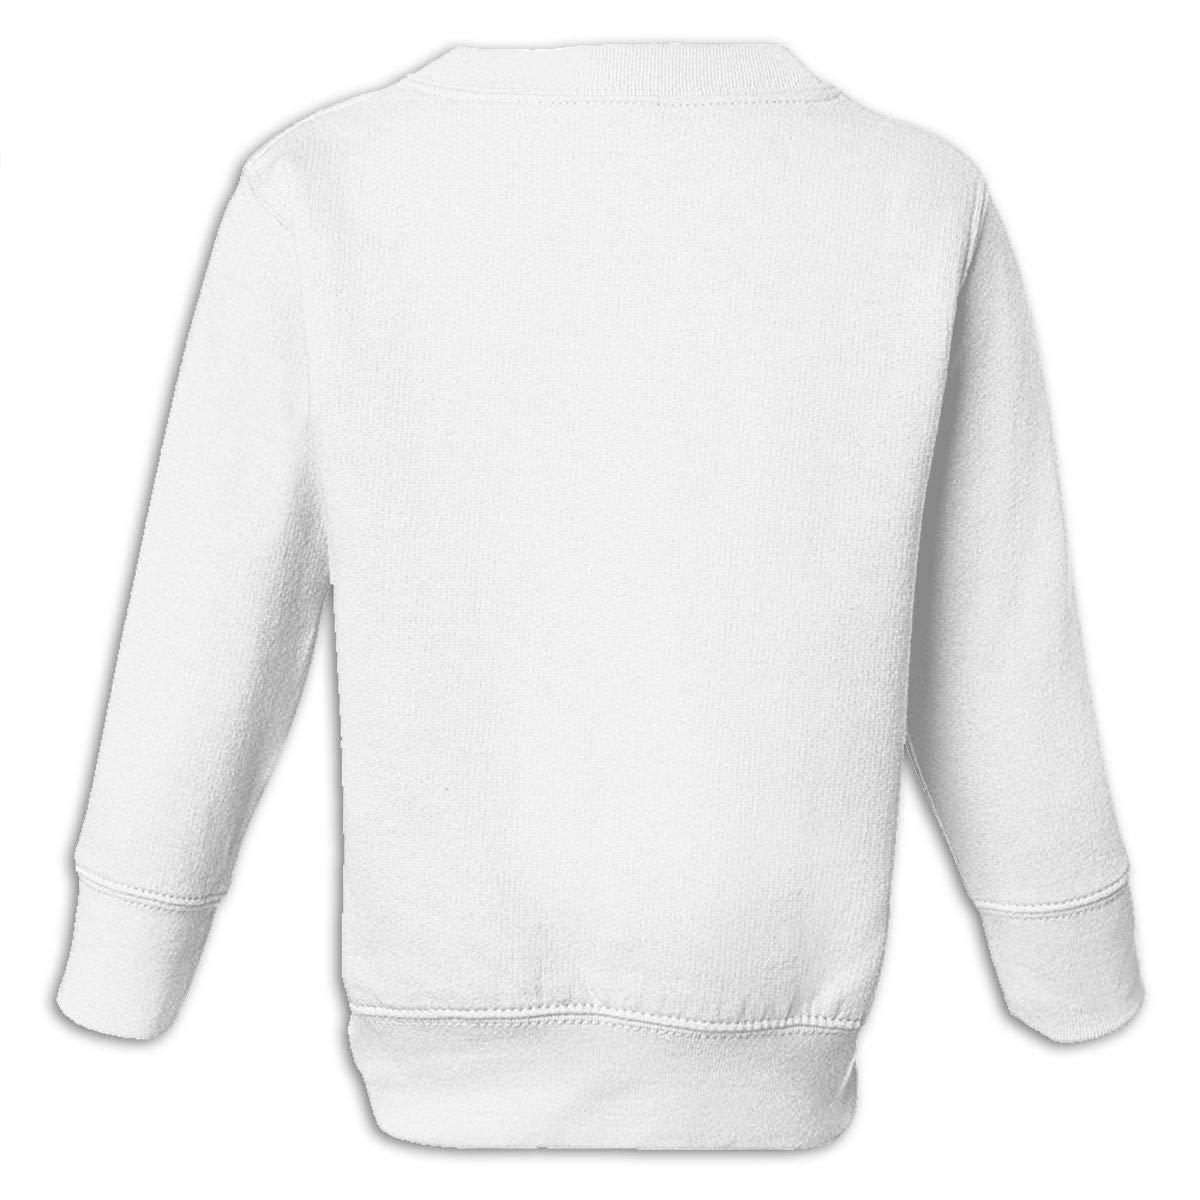 GHYNJUM Strawberry Kids Unisex Cotton Long Sleeve Round Neck Sweatshirt